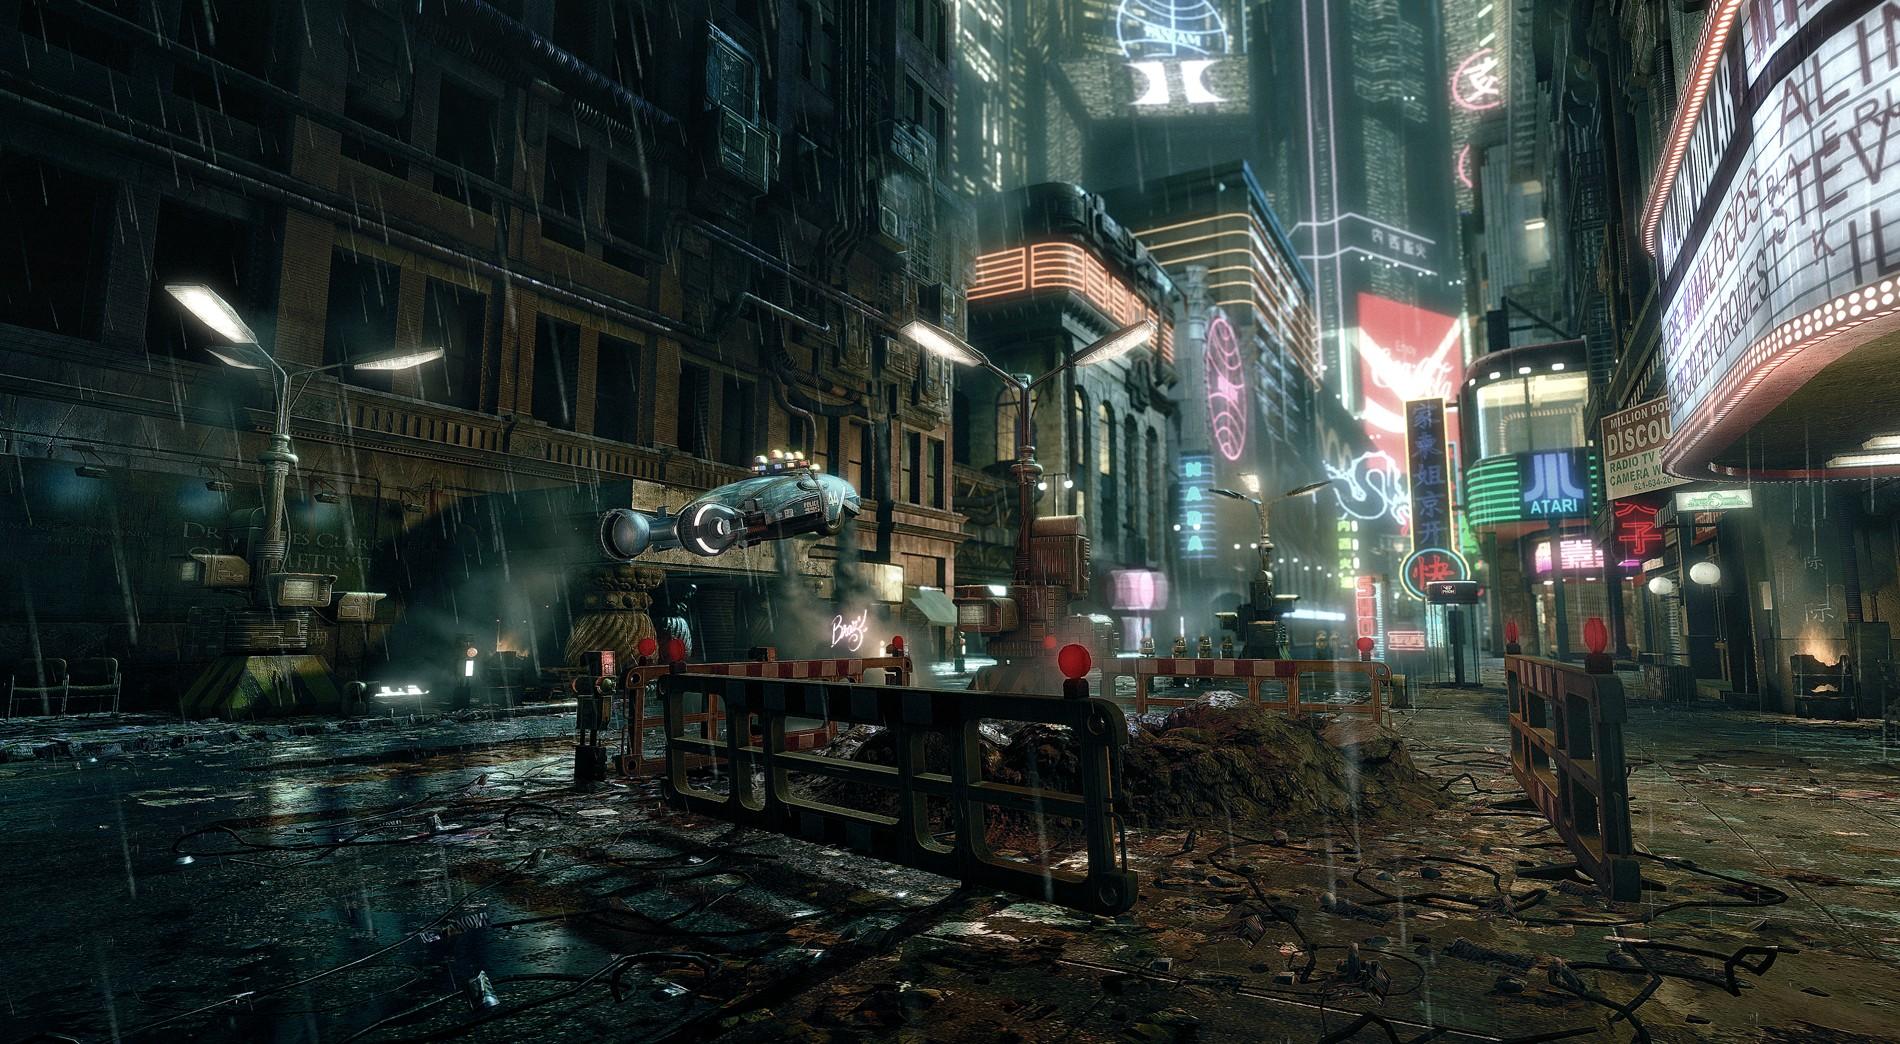 Blade Runner (Foto: Divulgação/Warner Bros. Pictures)